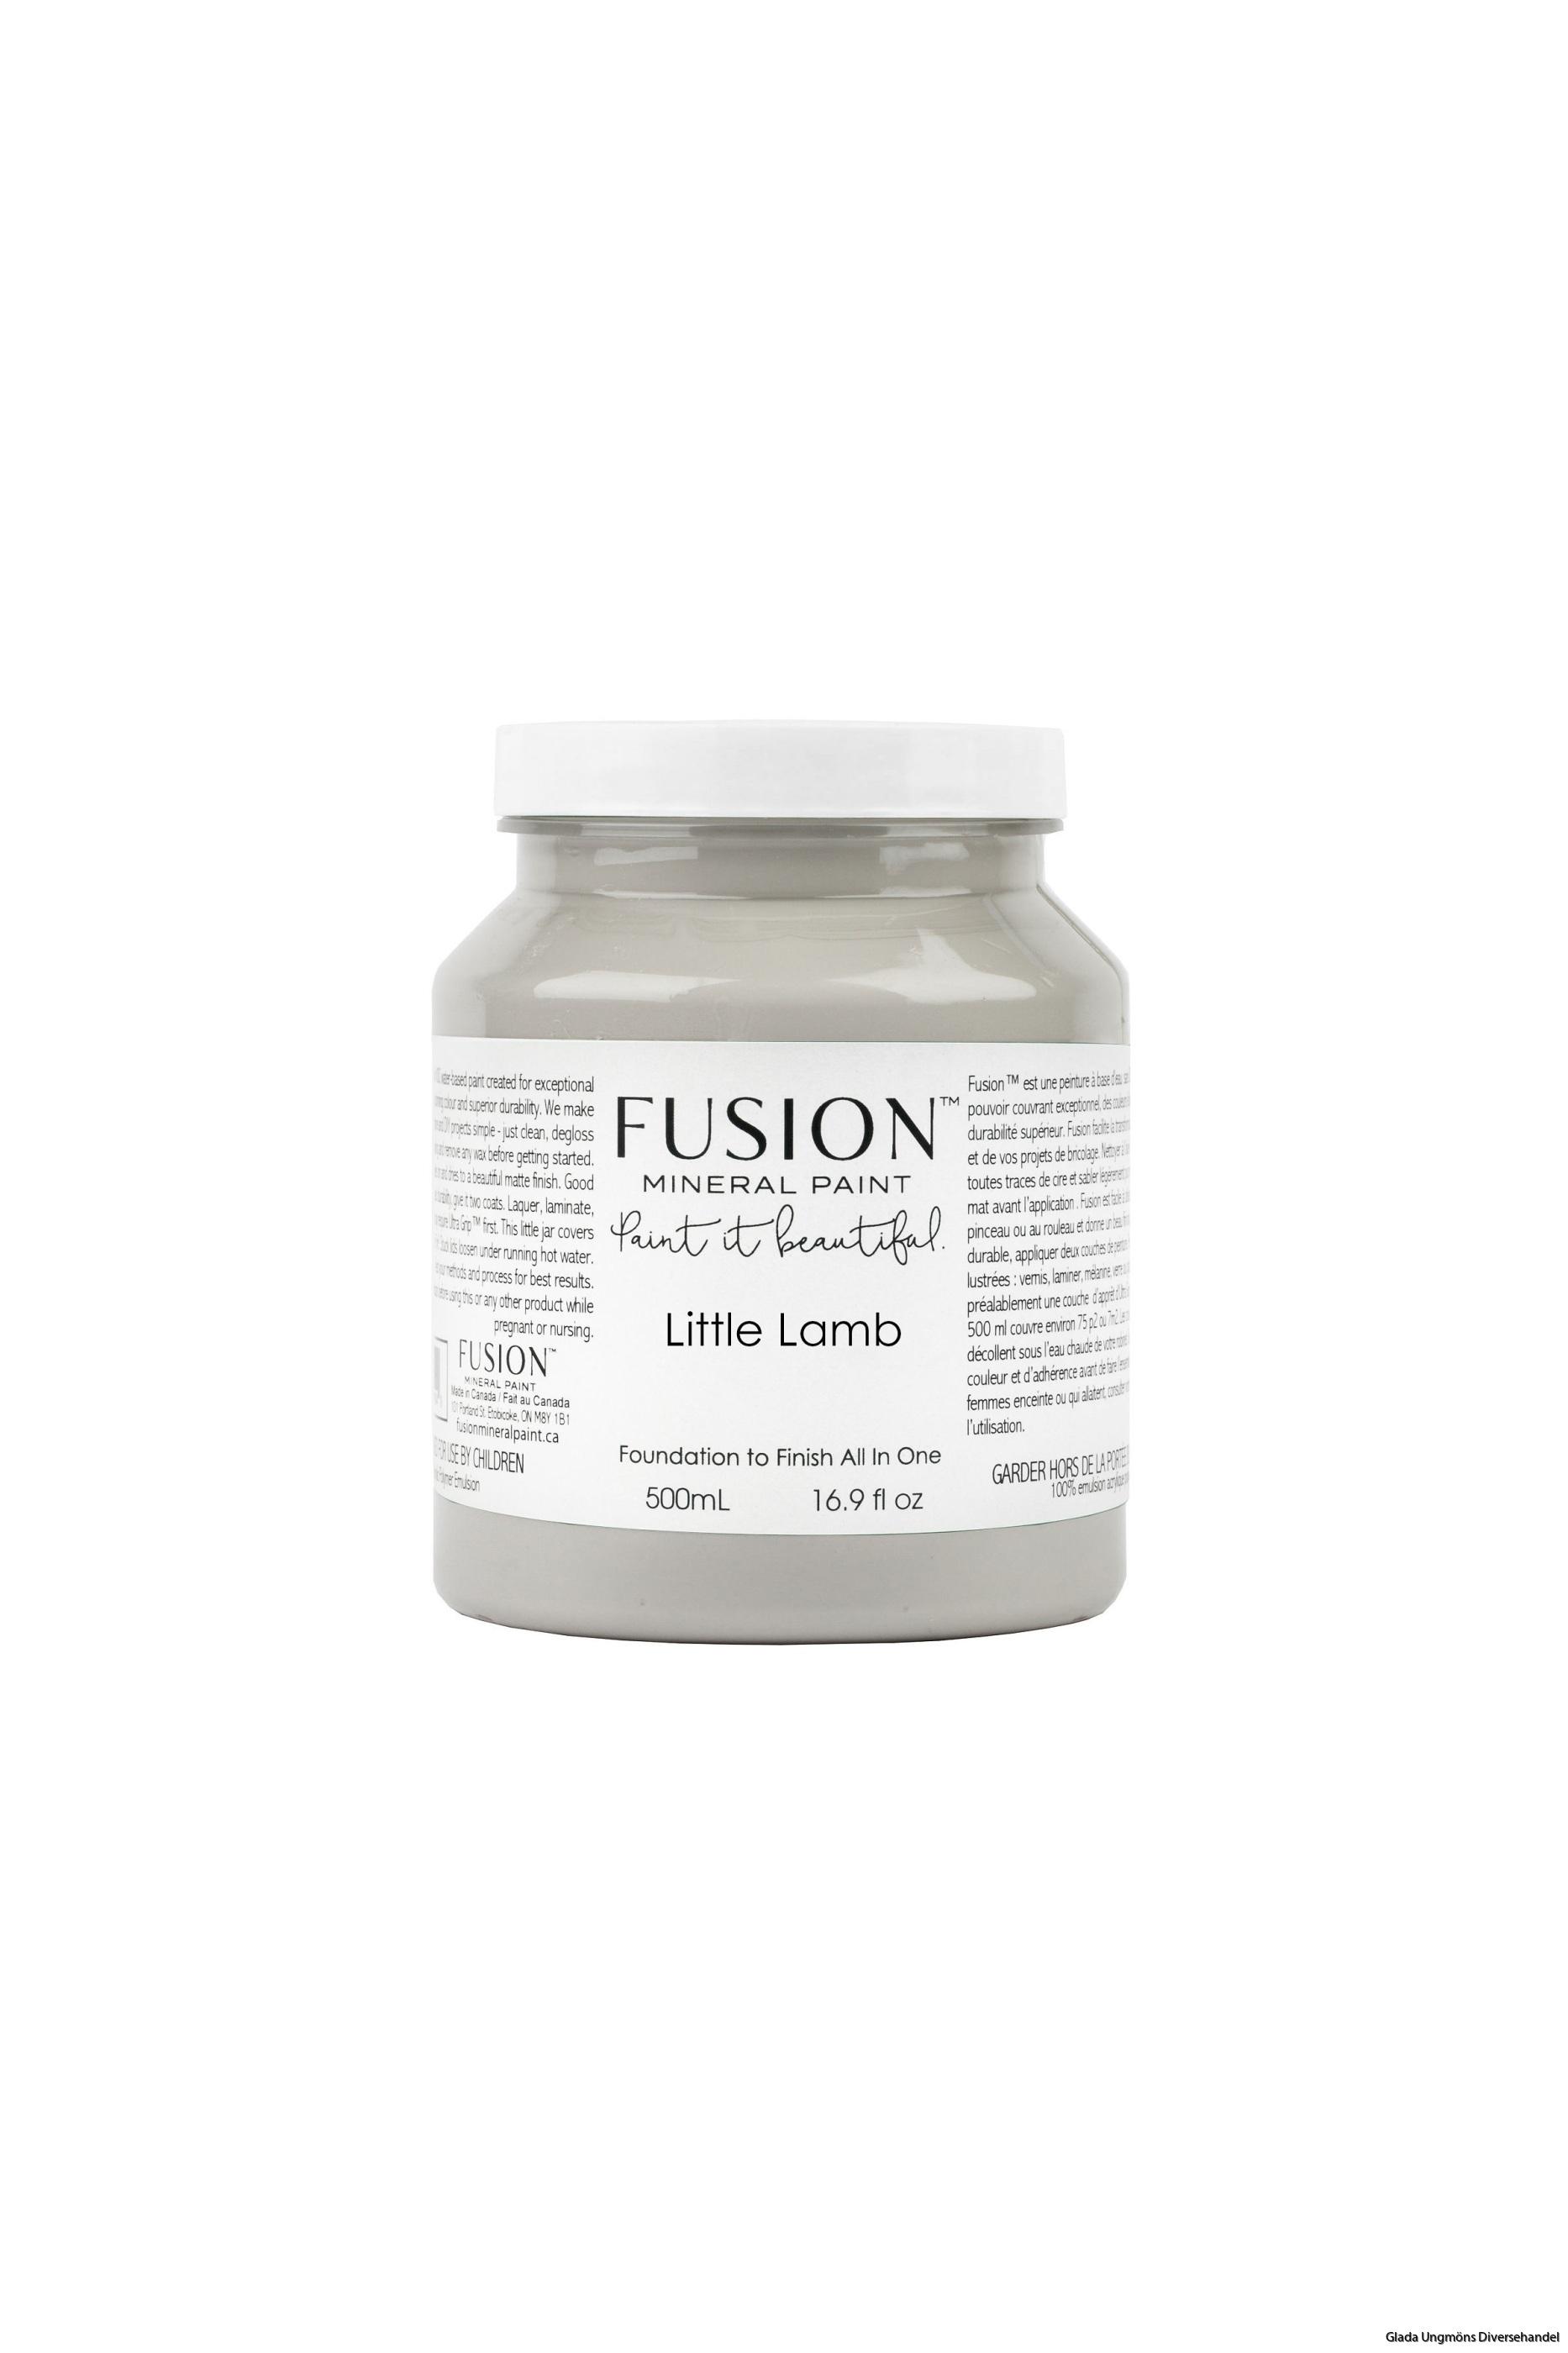 fusion_mineral_paint-littlelamb-pint